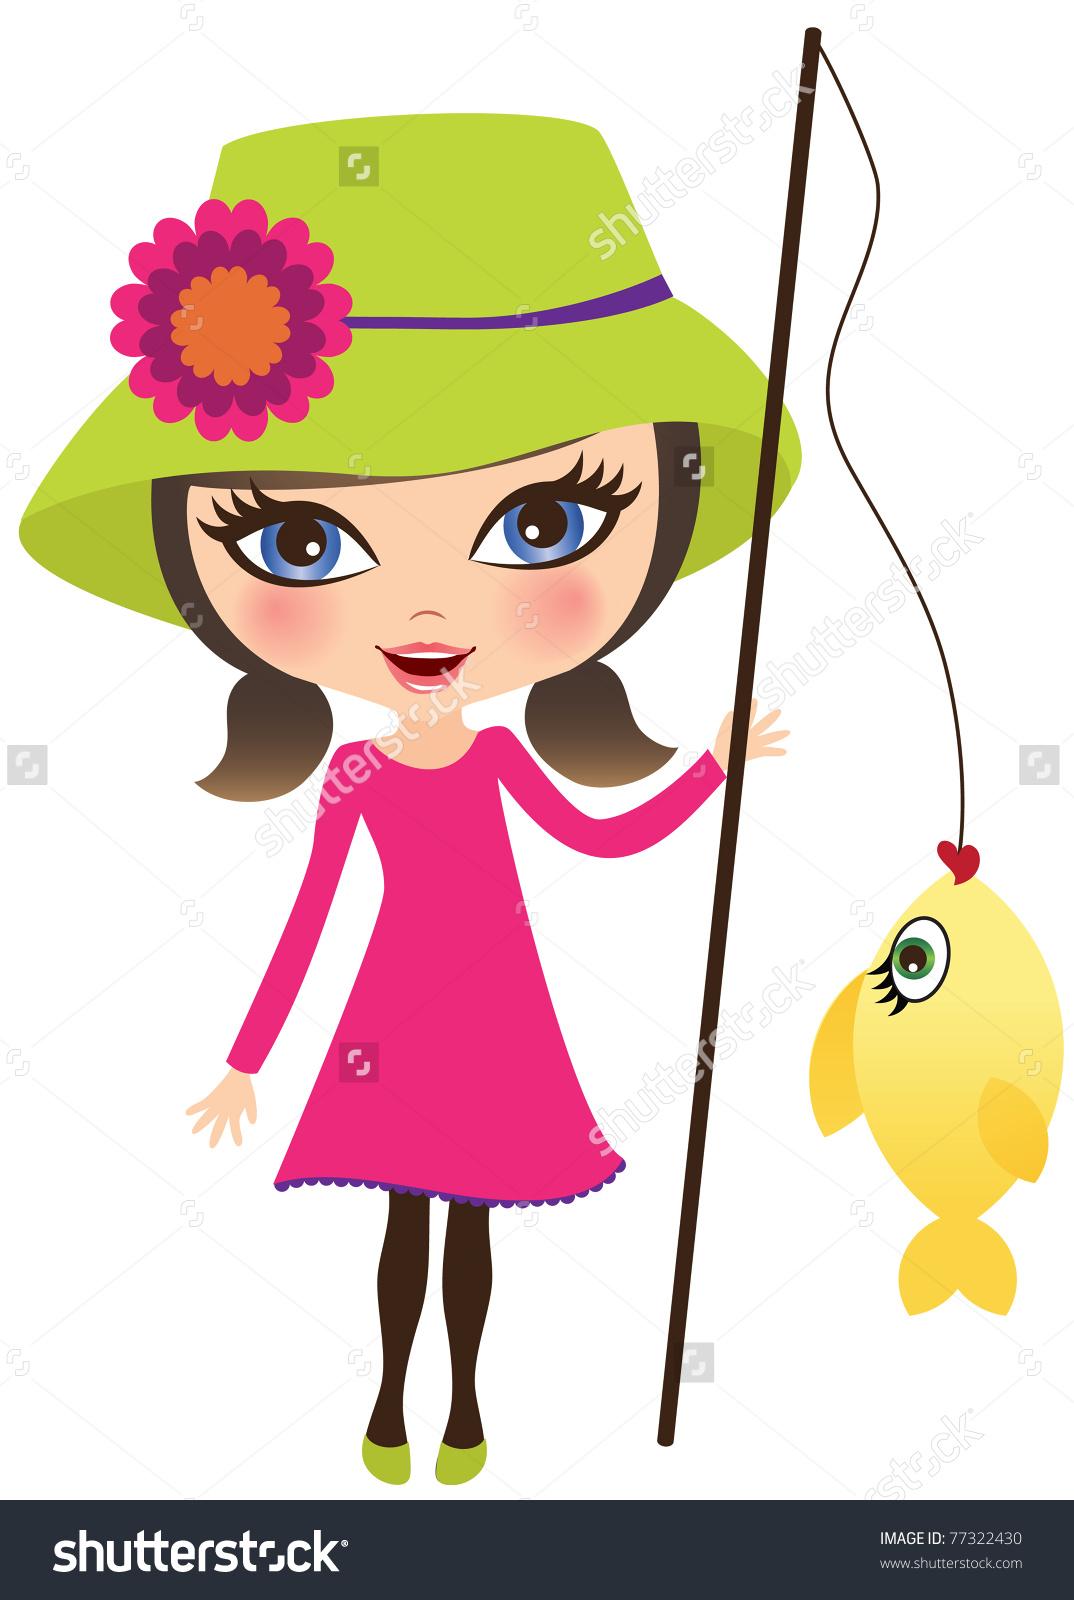 Fish Girl clipart #17, Download drawings